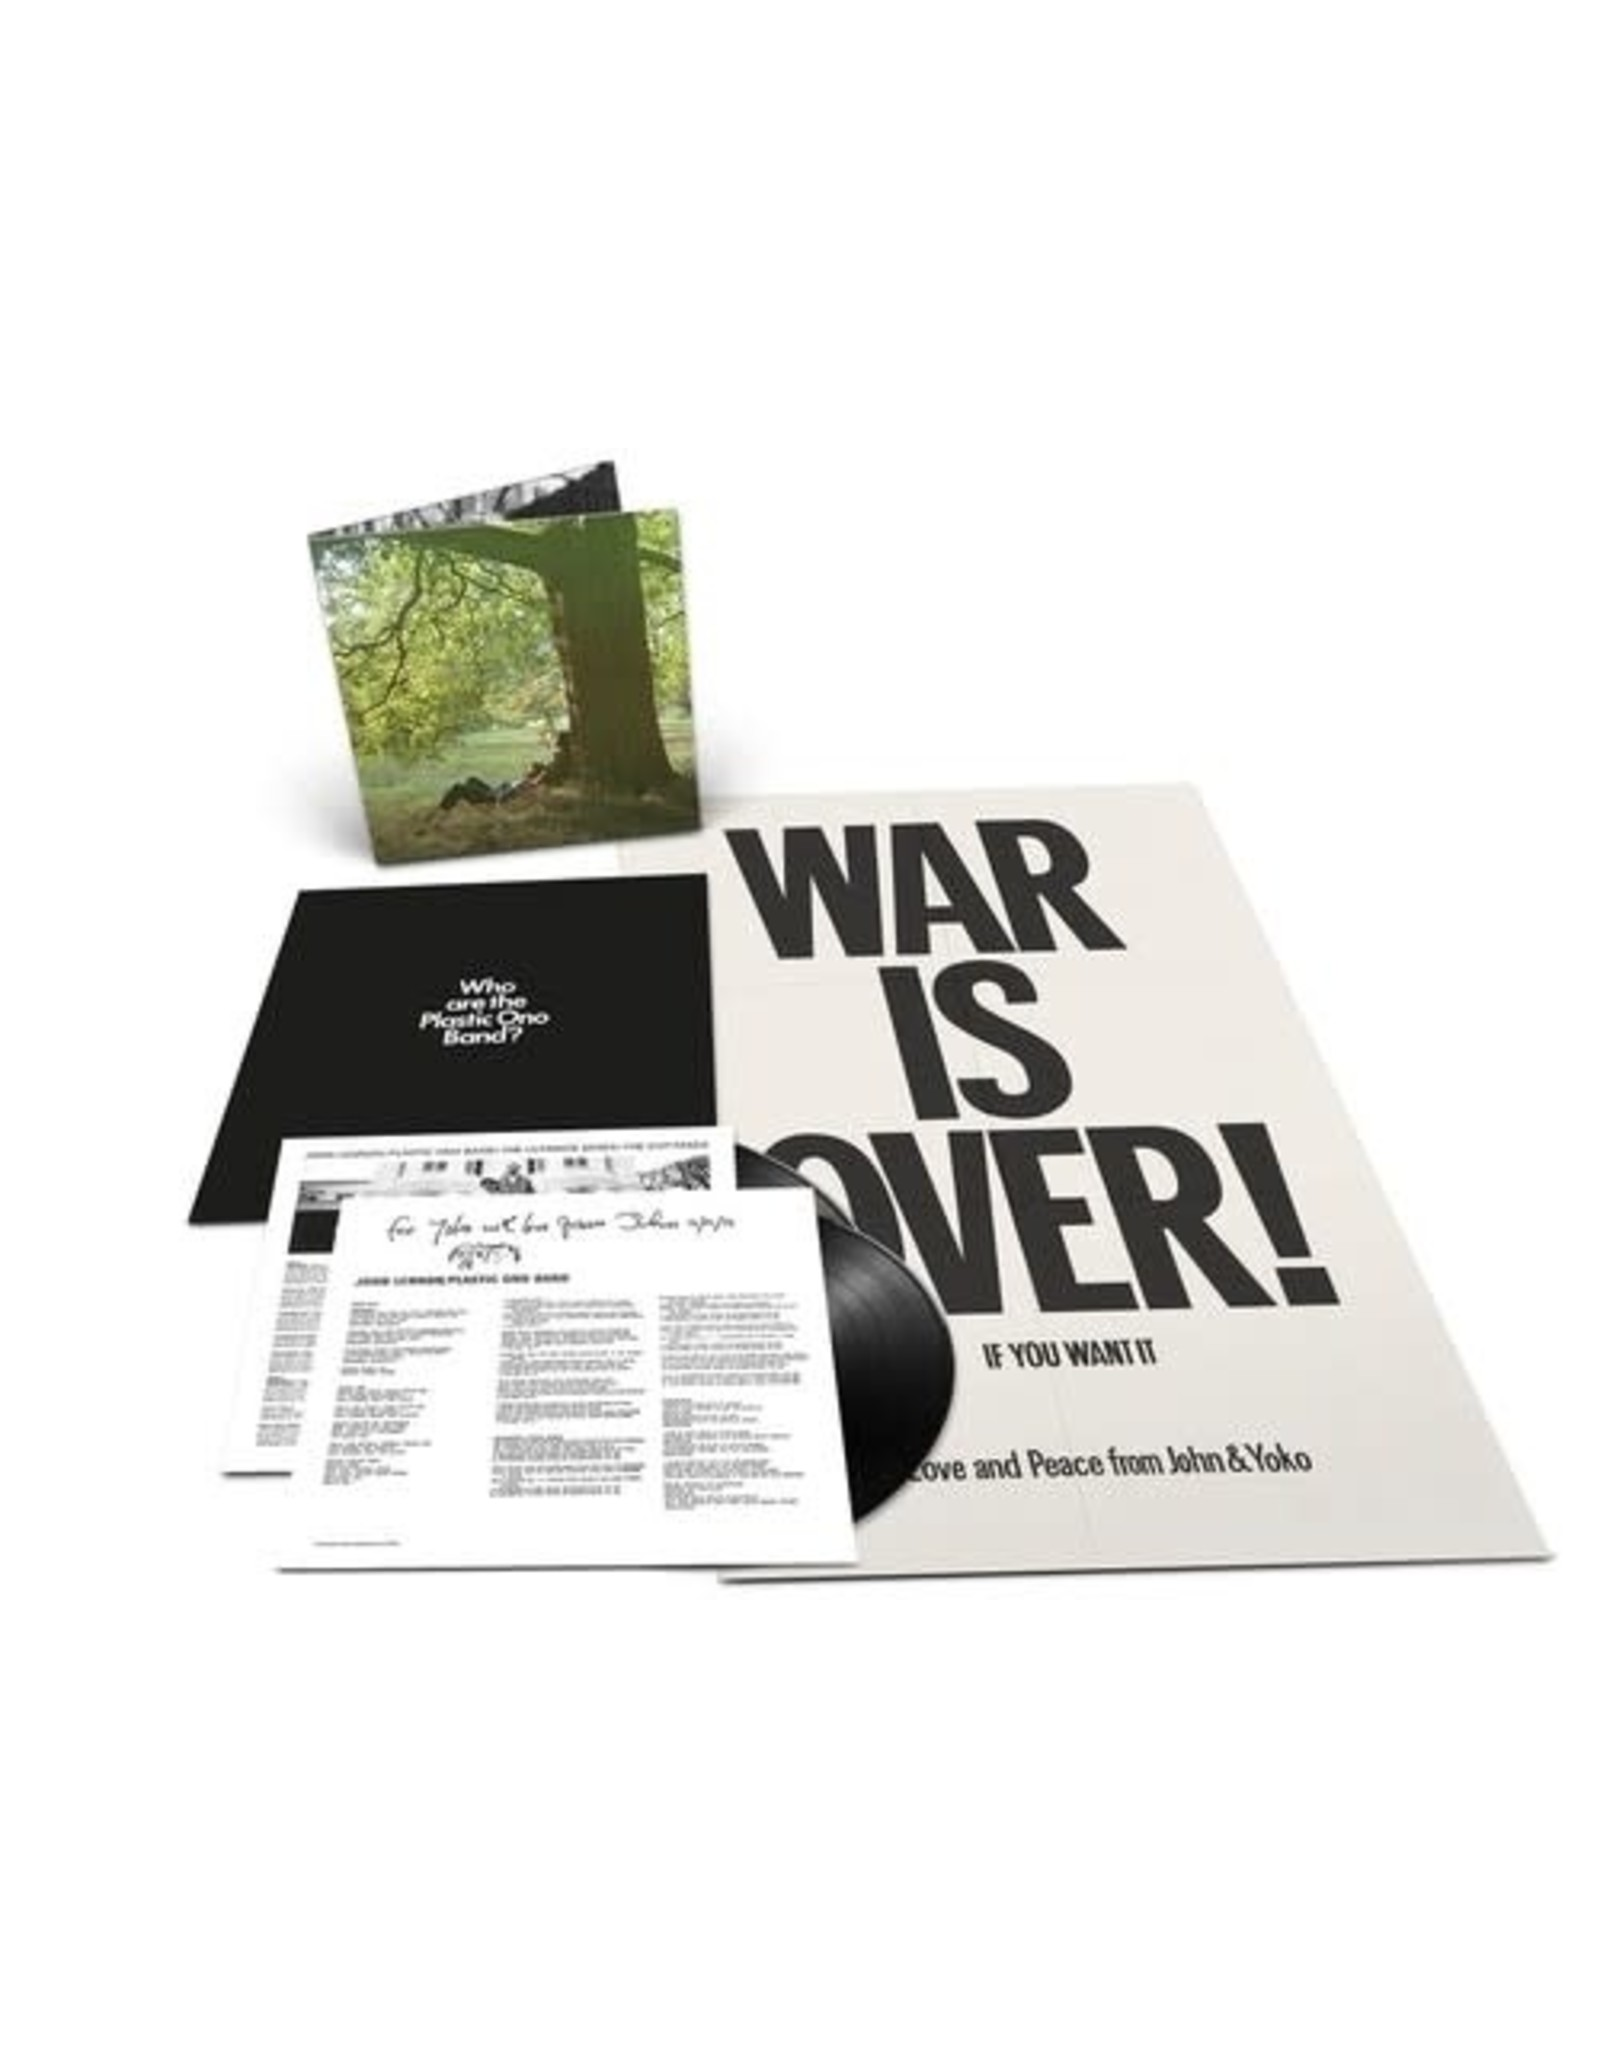 New Vinyl John Lennon / Plastic Ono Band - S/T (The Ultimate Mixes) 2LP